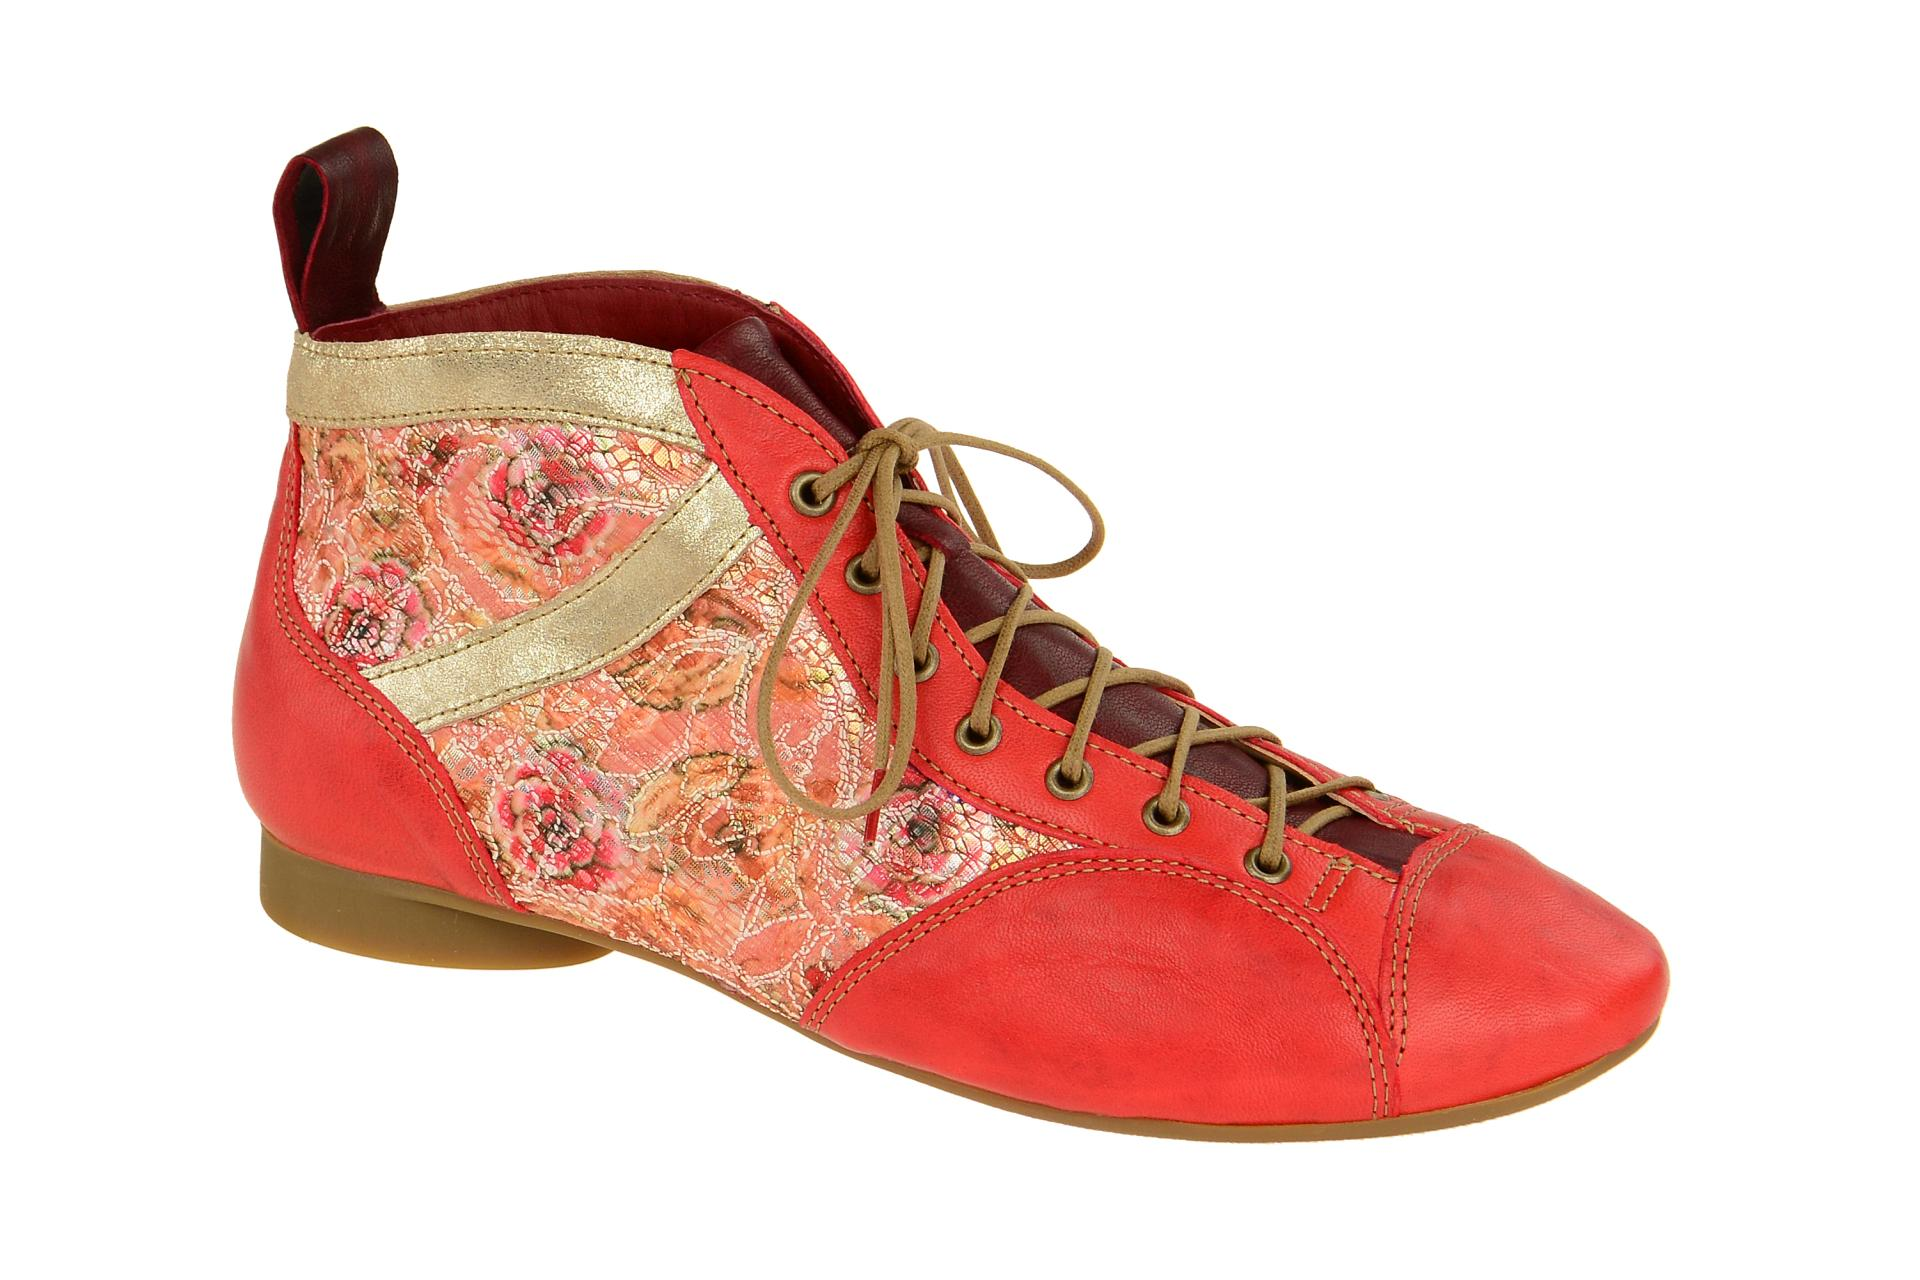 brand new 0234a 29784 Details zu Think Schuhe GUAD rot Damen Stiefeletten bequeme Stiefelette  2-82288-76 NEU